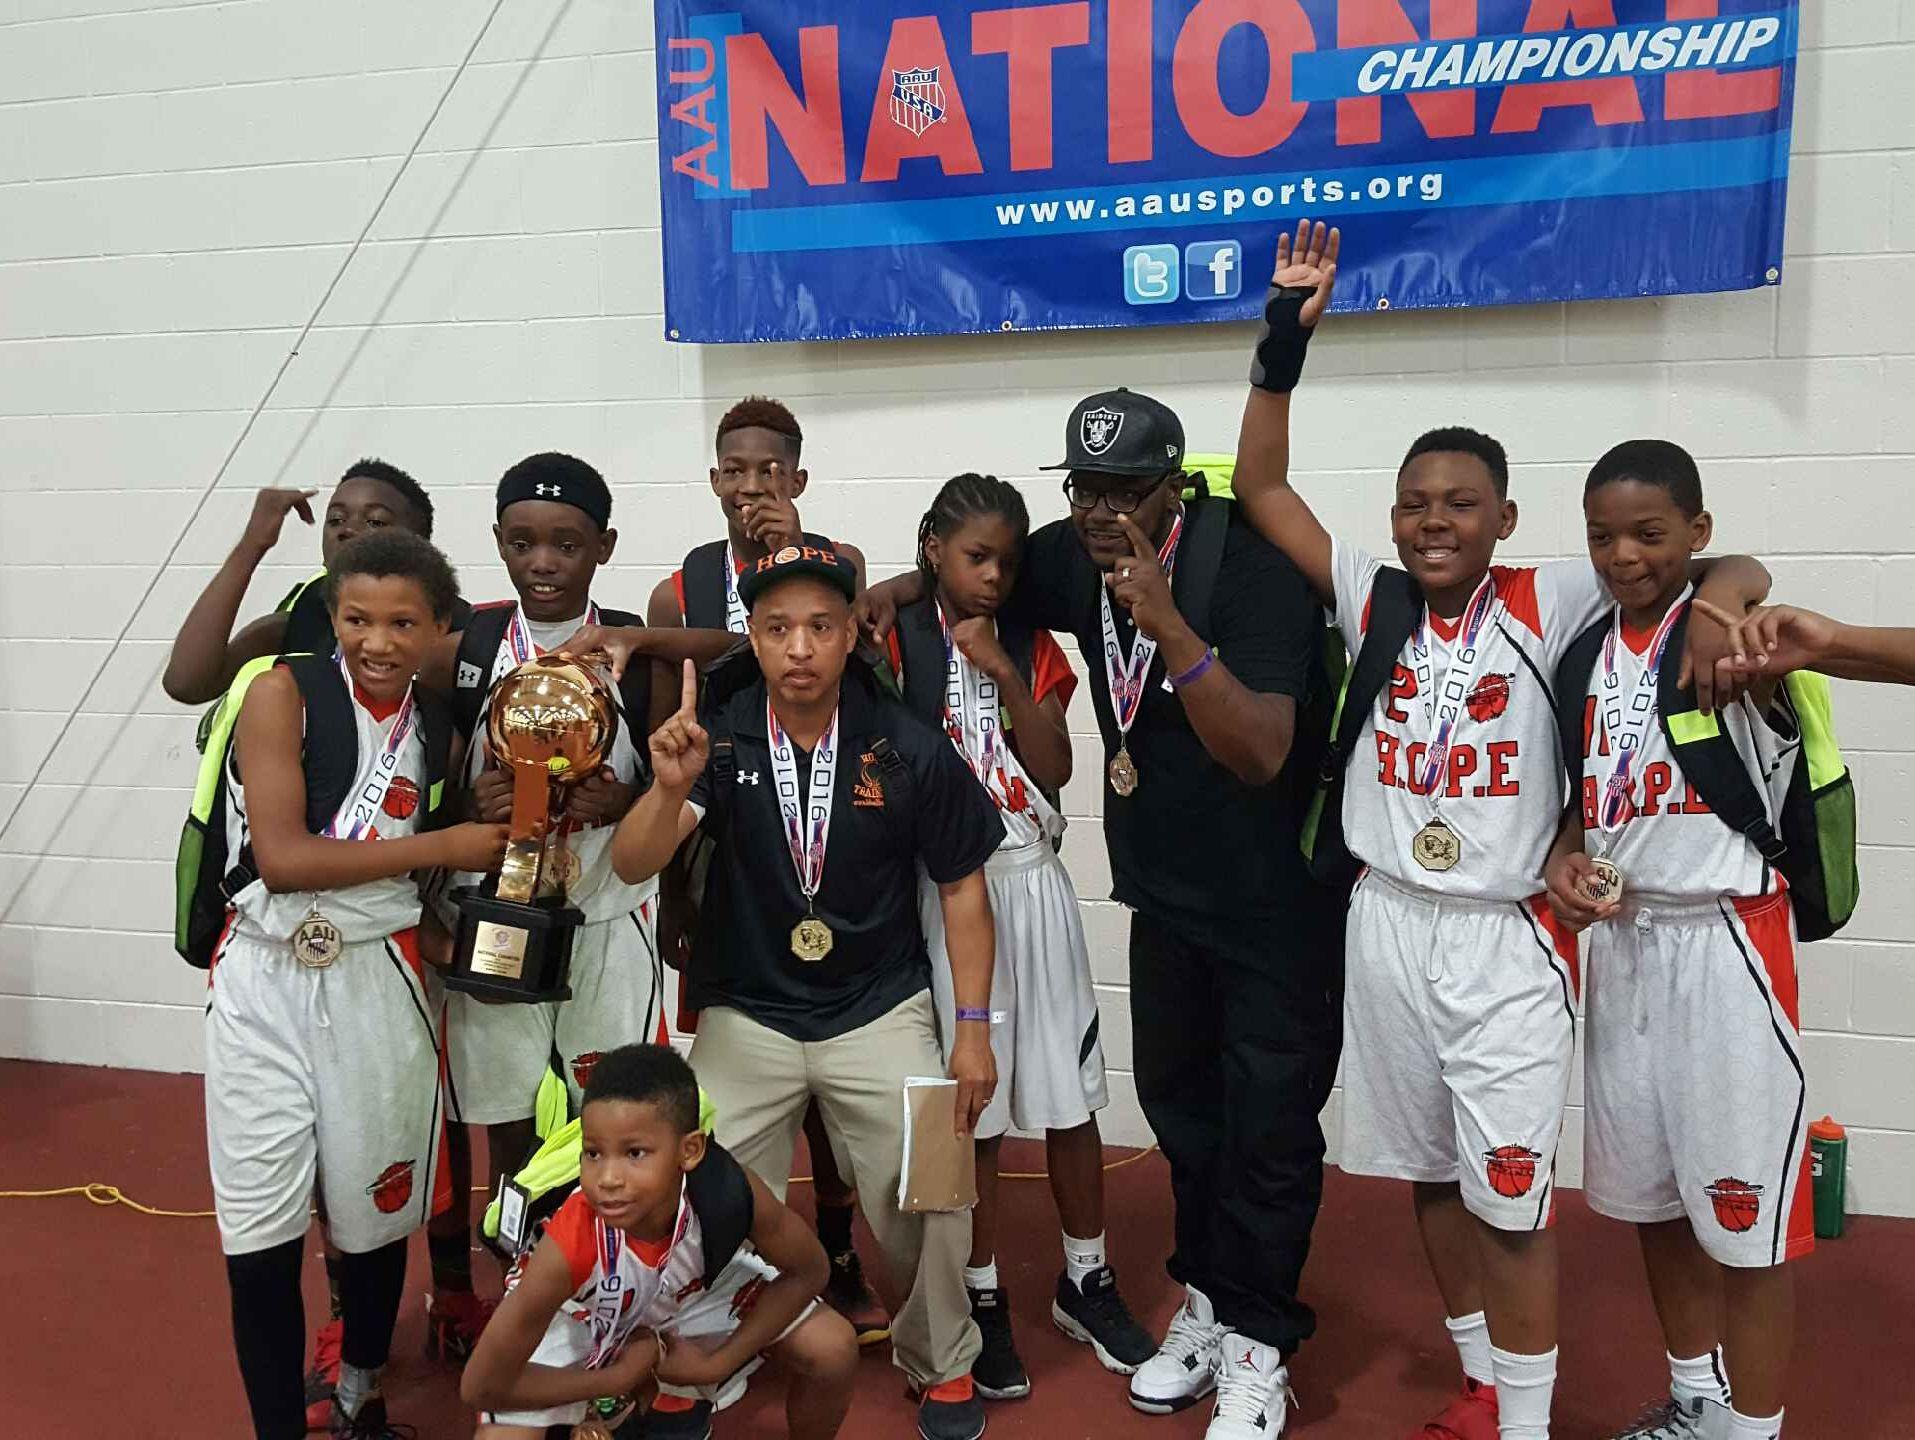 The H.O.P.E. Elite U11 team celebrates its national championship.